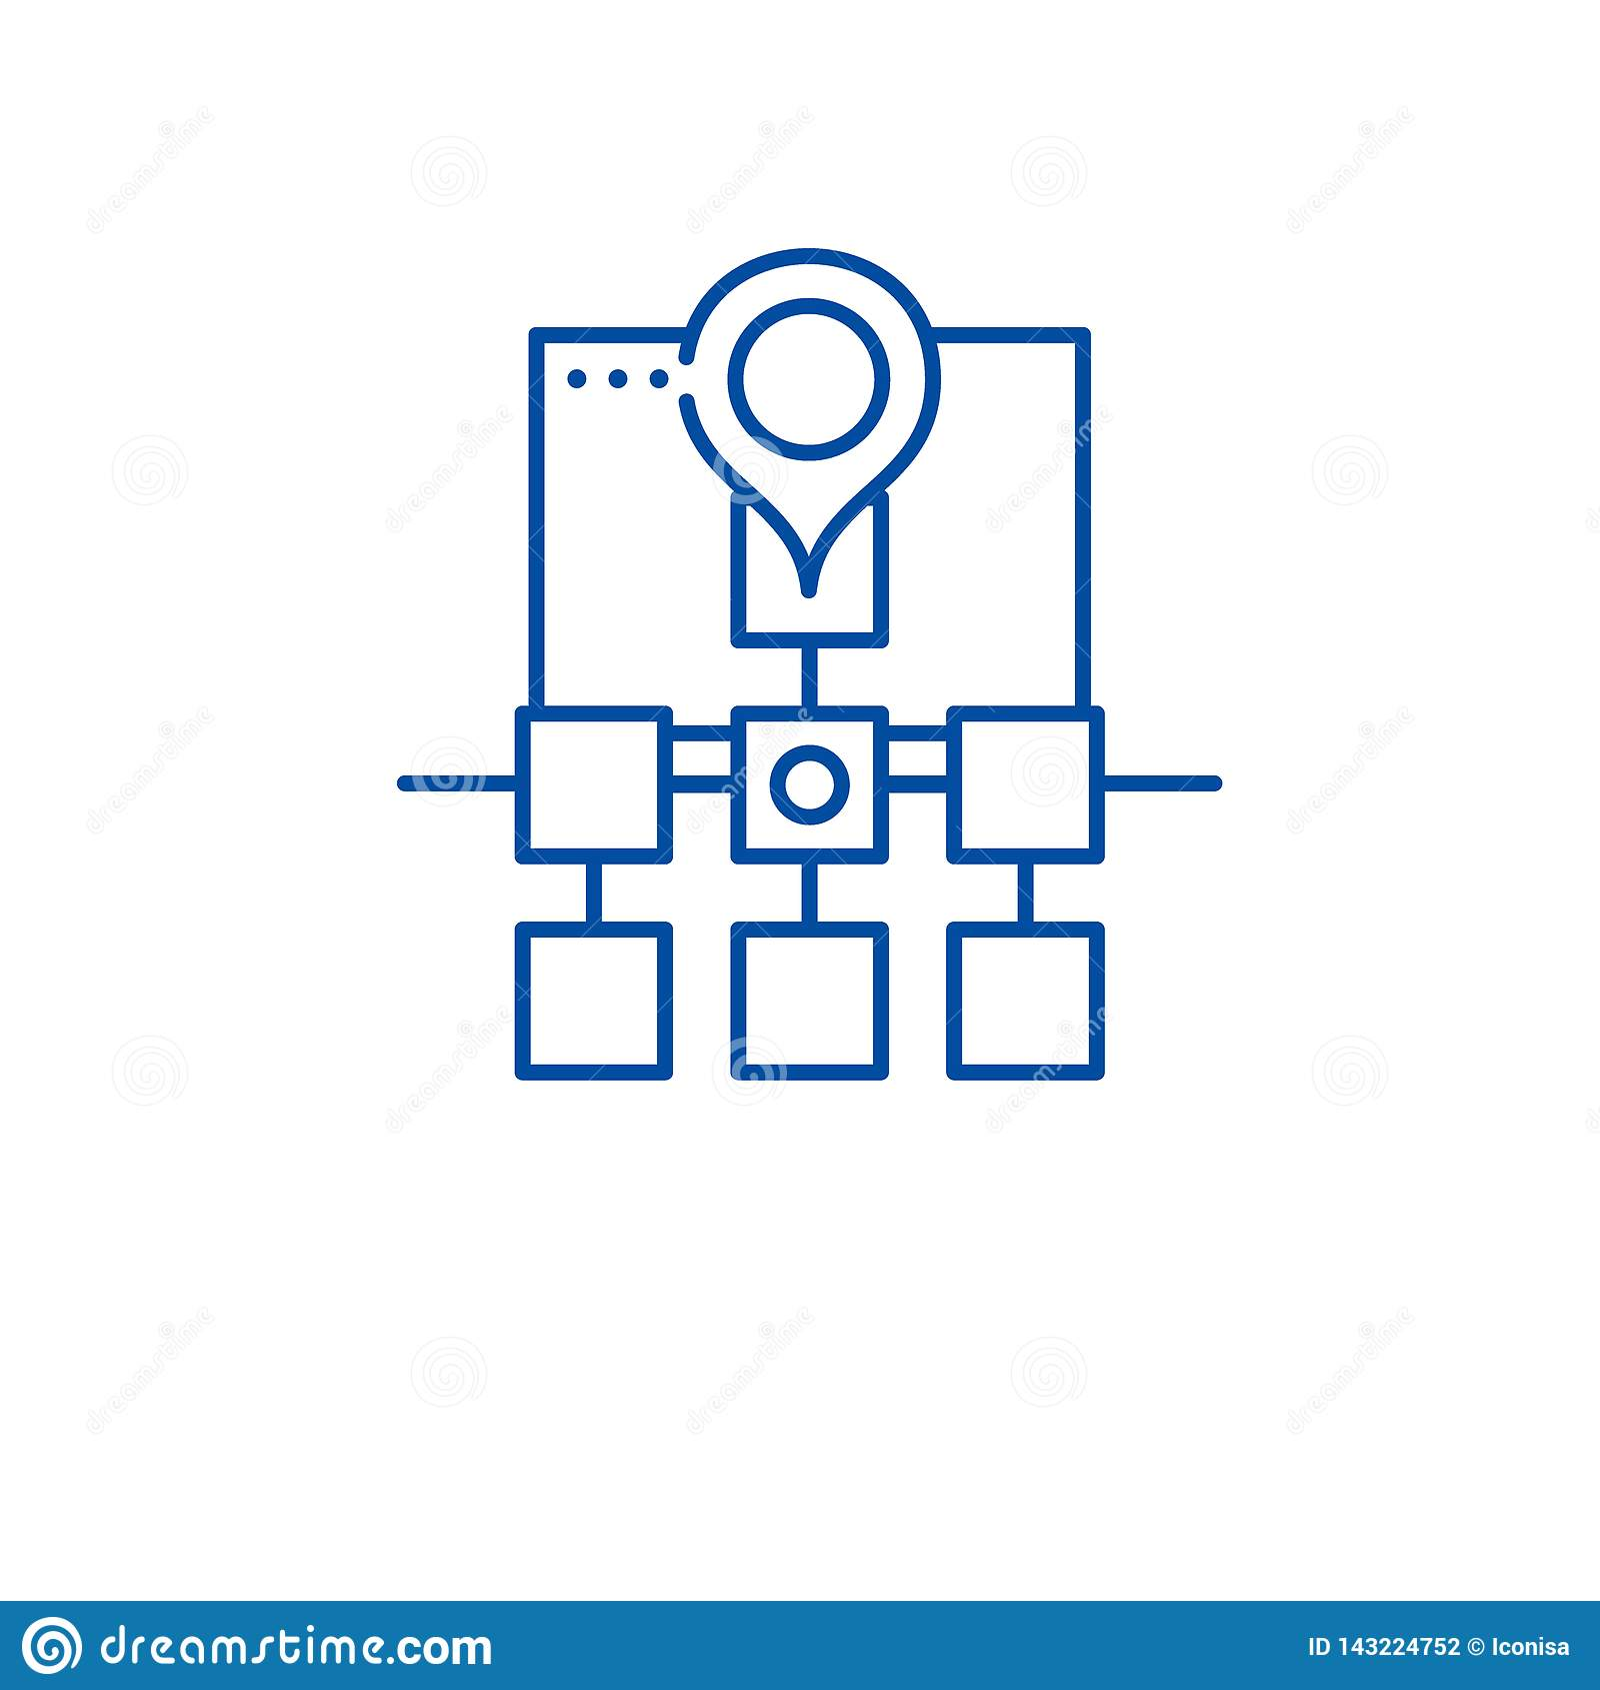 Sitemap web structure line icon concept. Sitemap web structure flat vector symbol, sign, outline illustration.